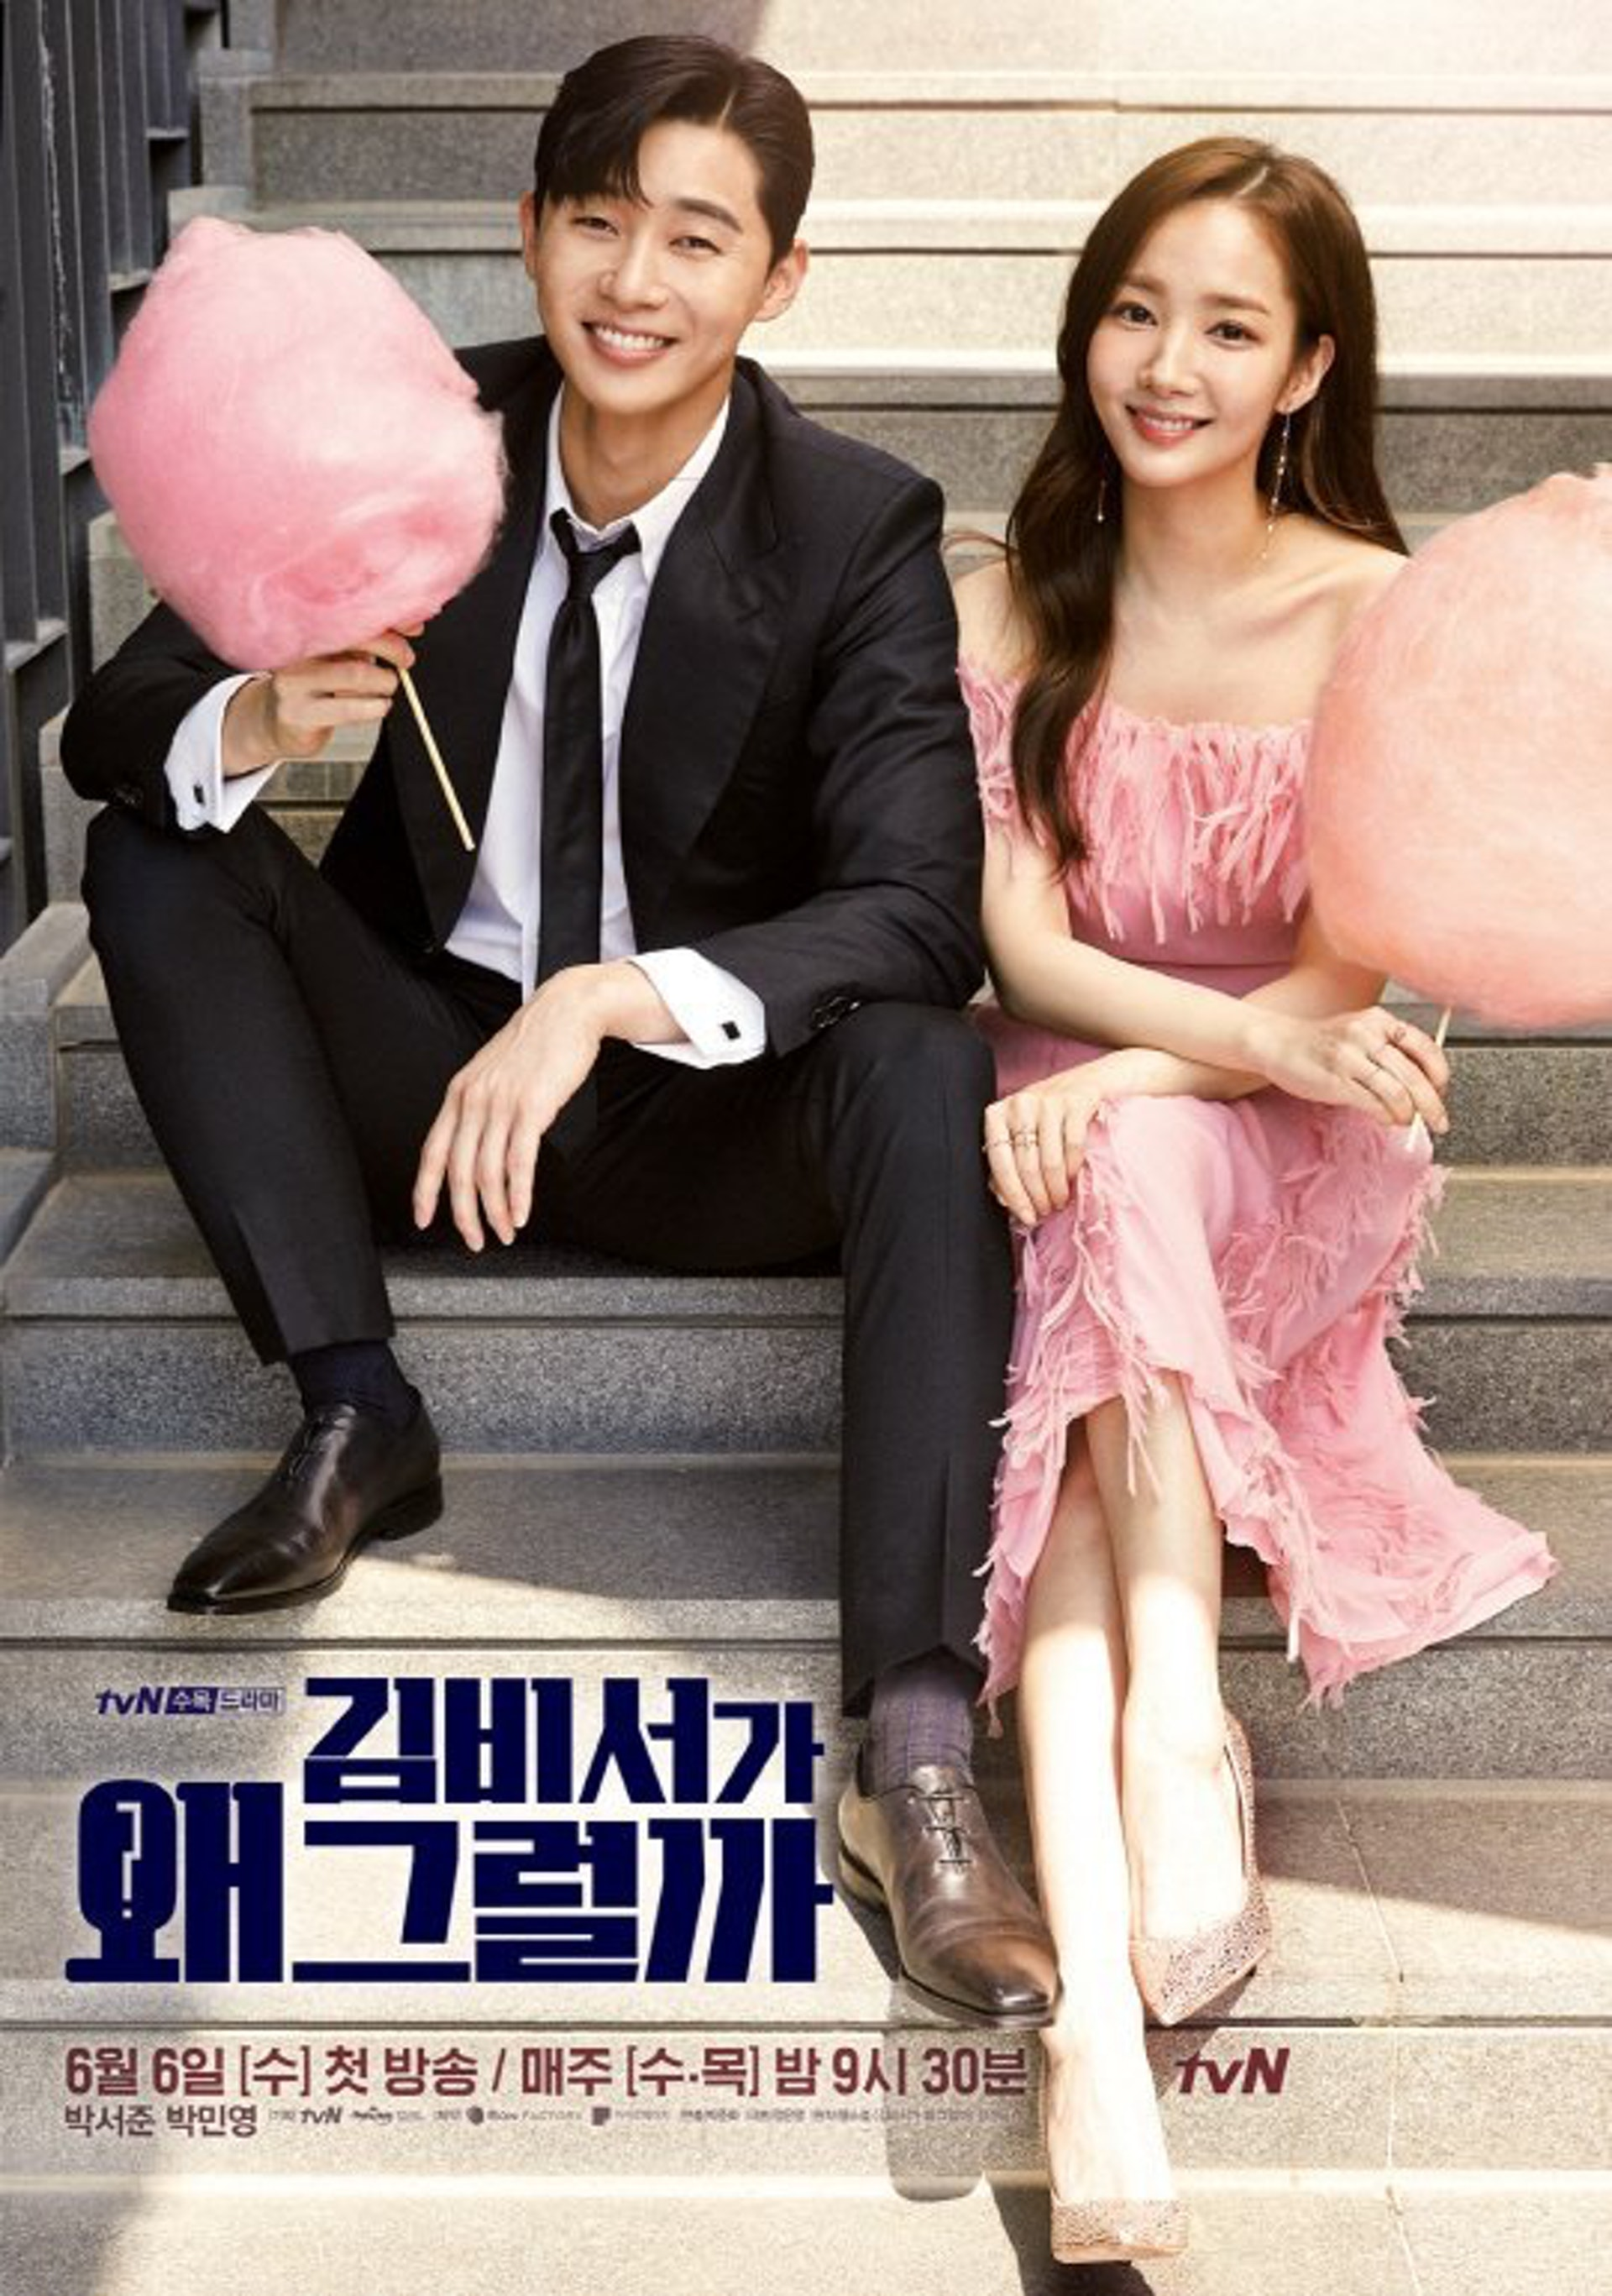 سریال کره ای منشی کیم چشه ؟